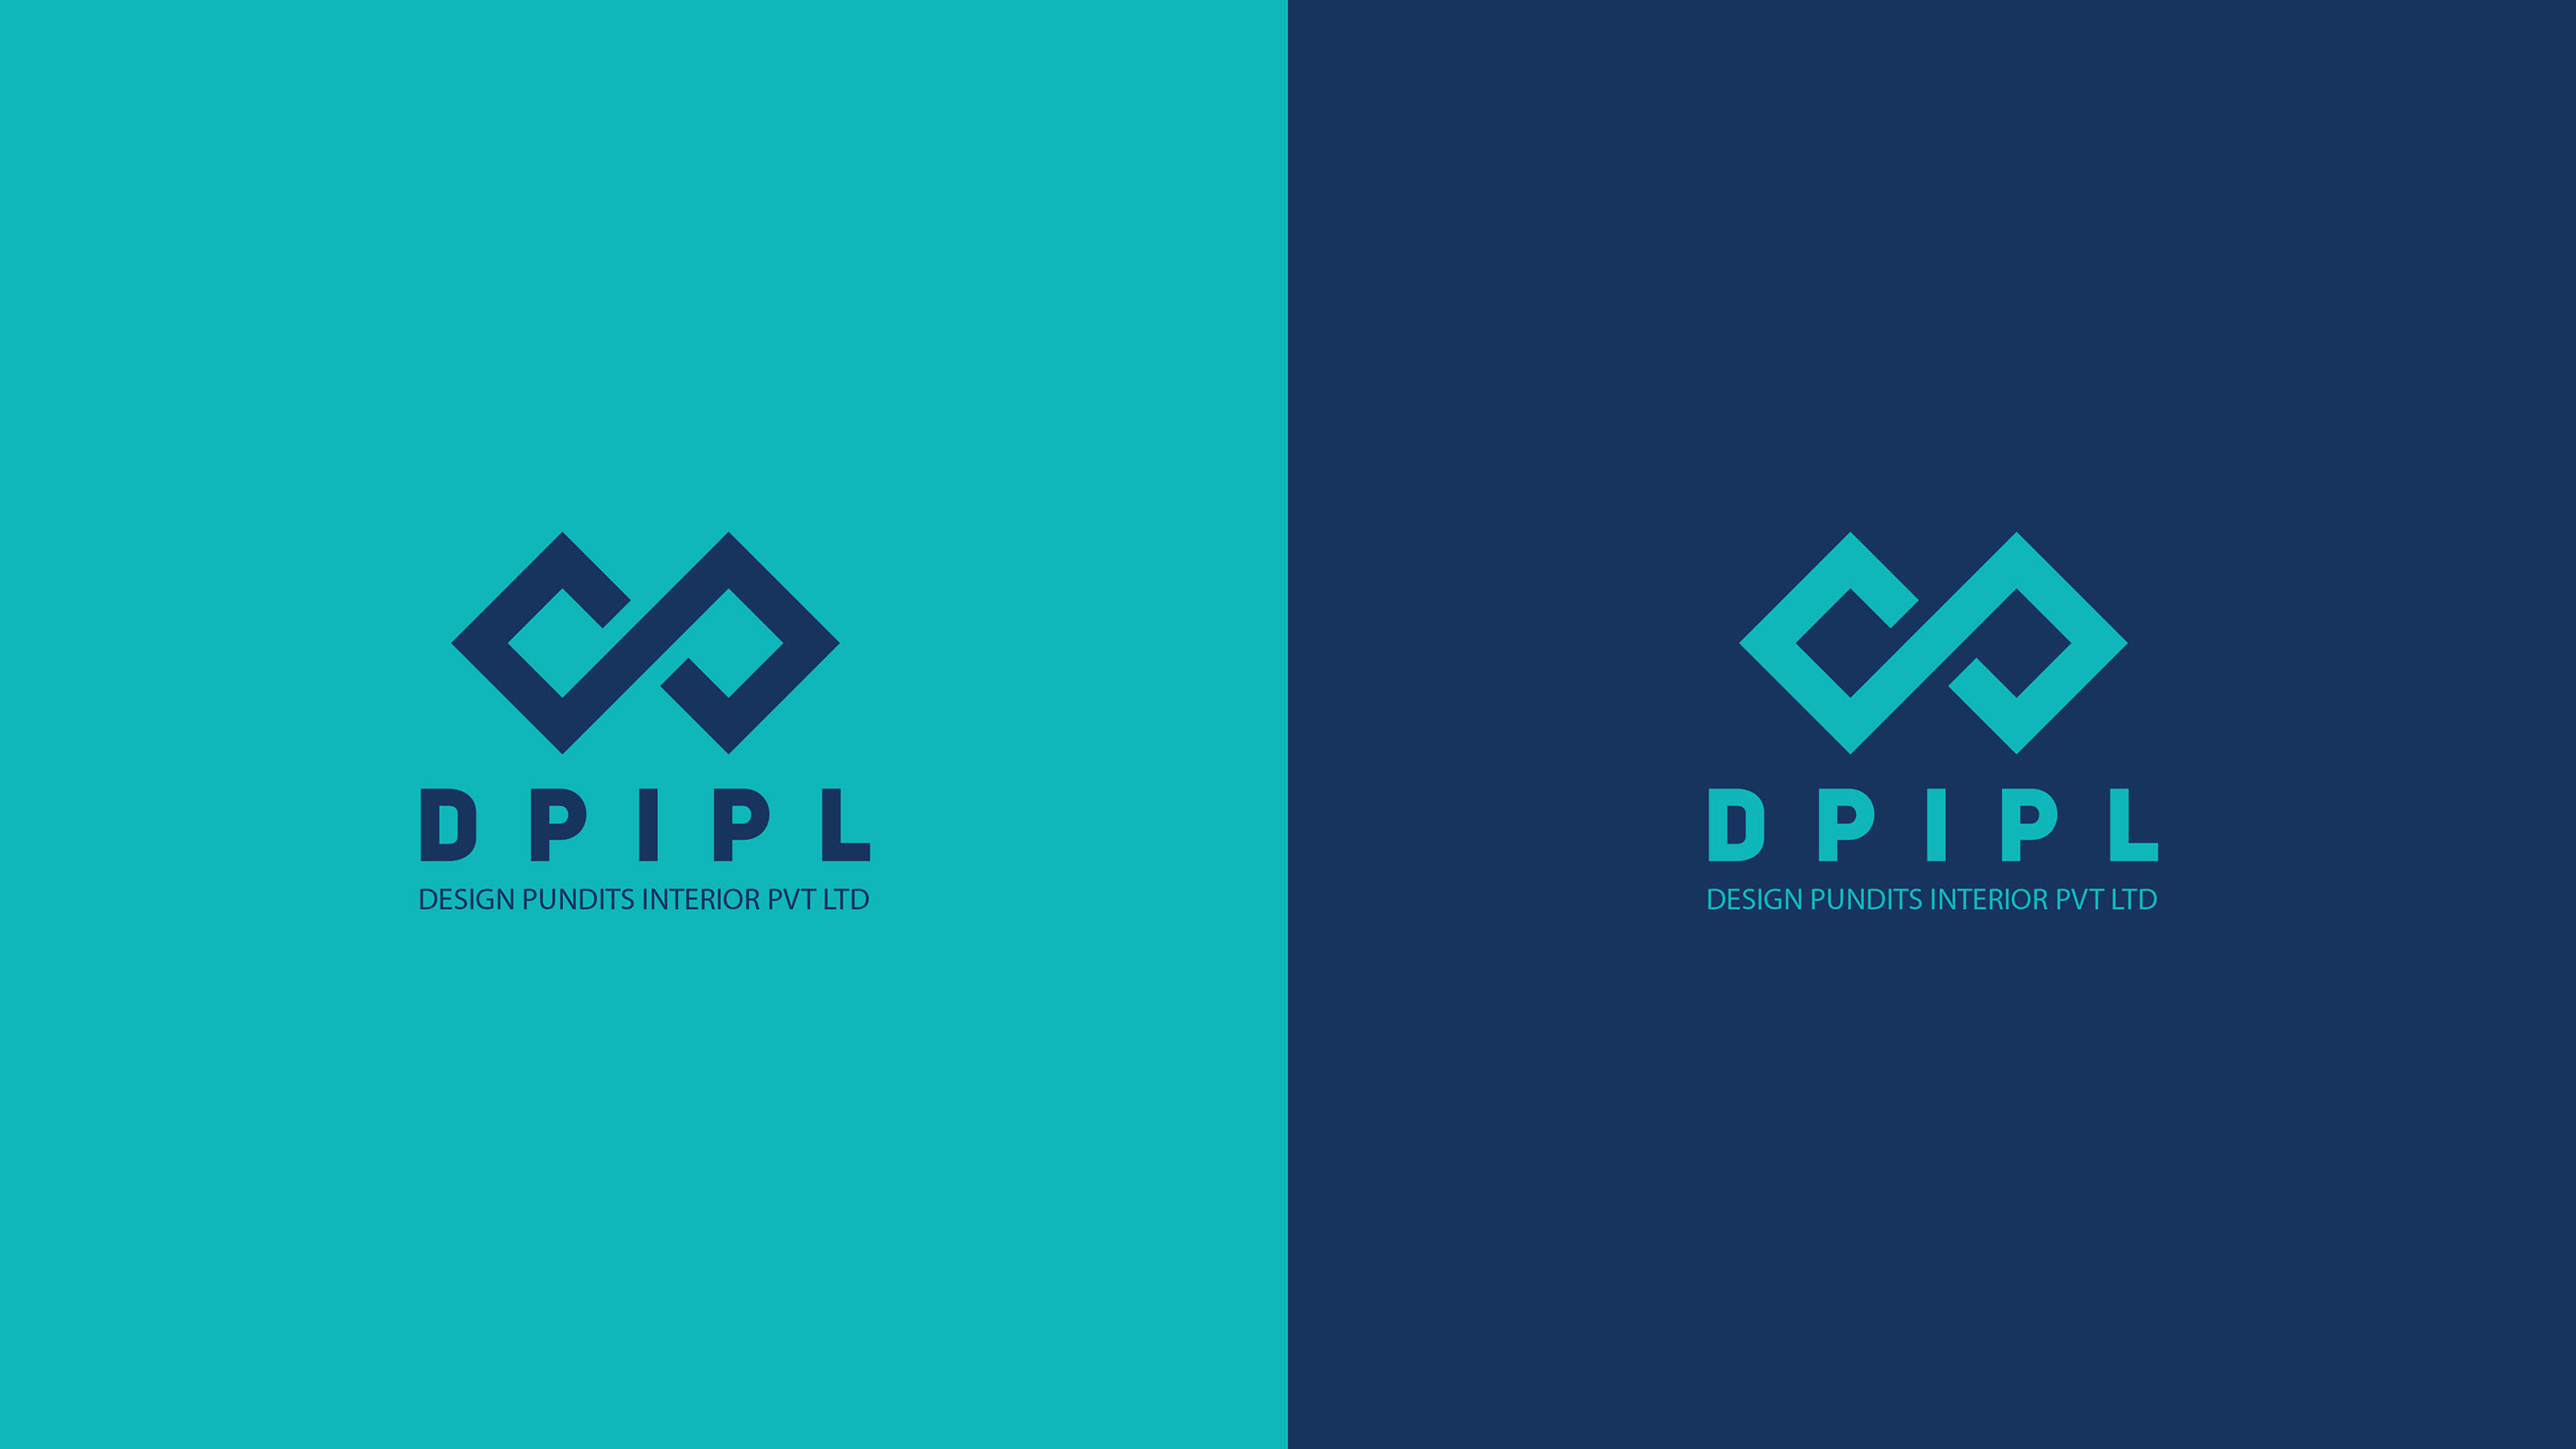 Brand Identity Dpipl On Behance